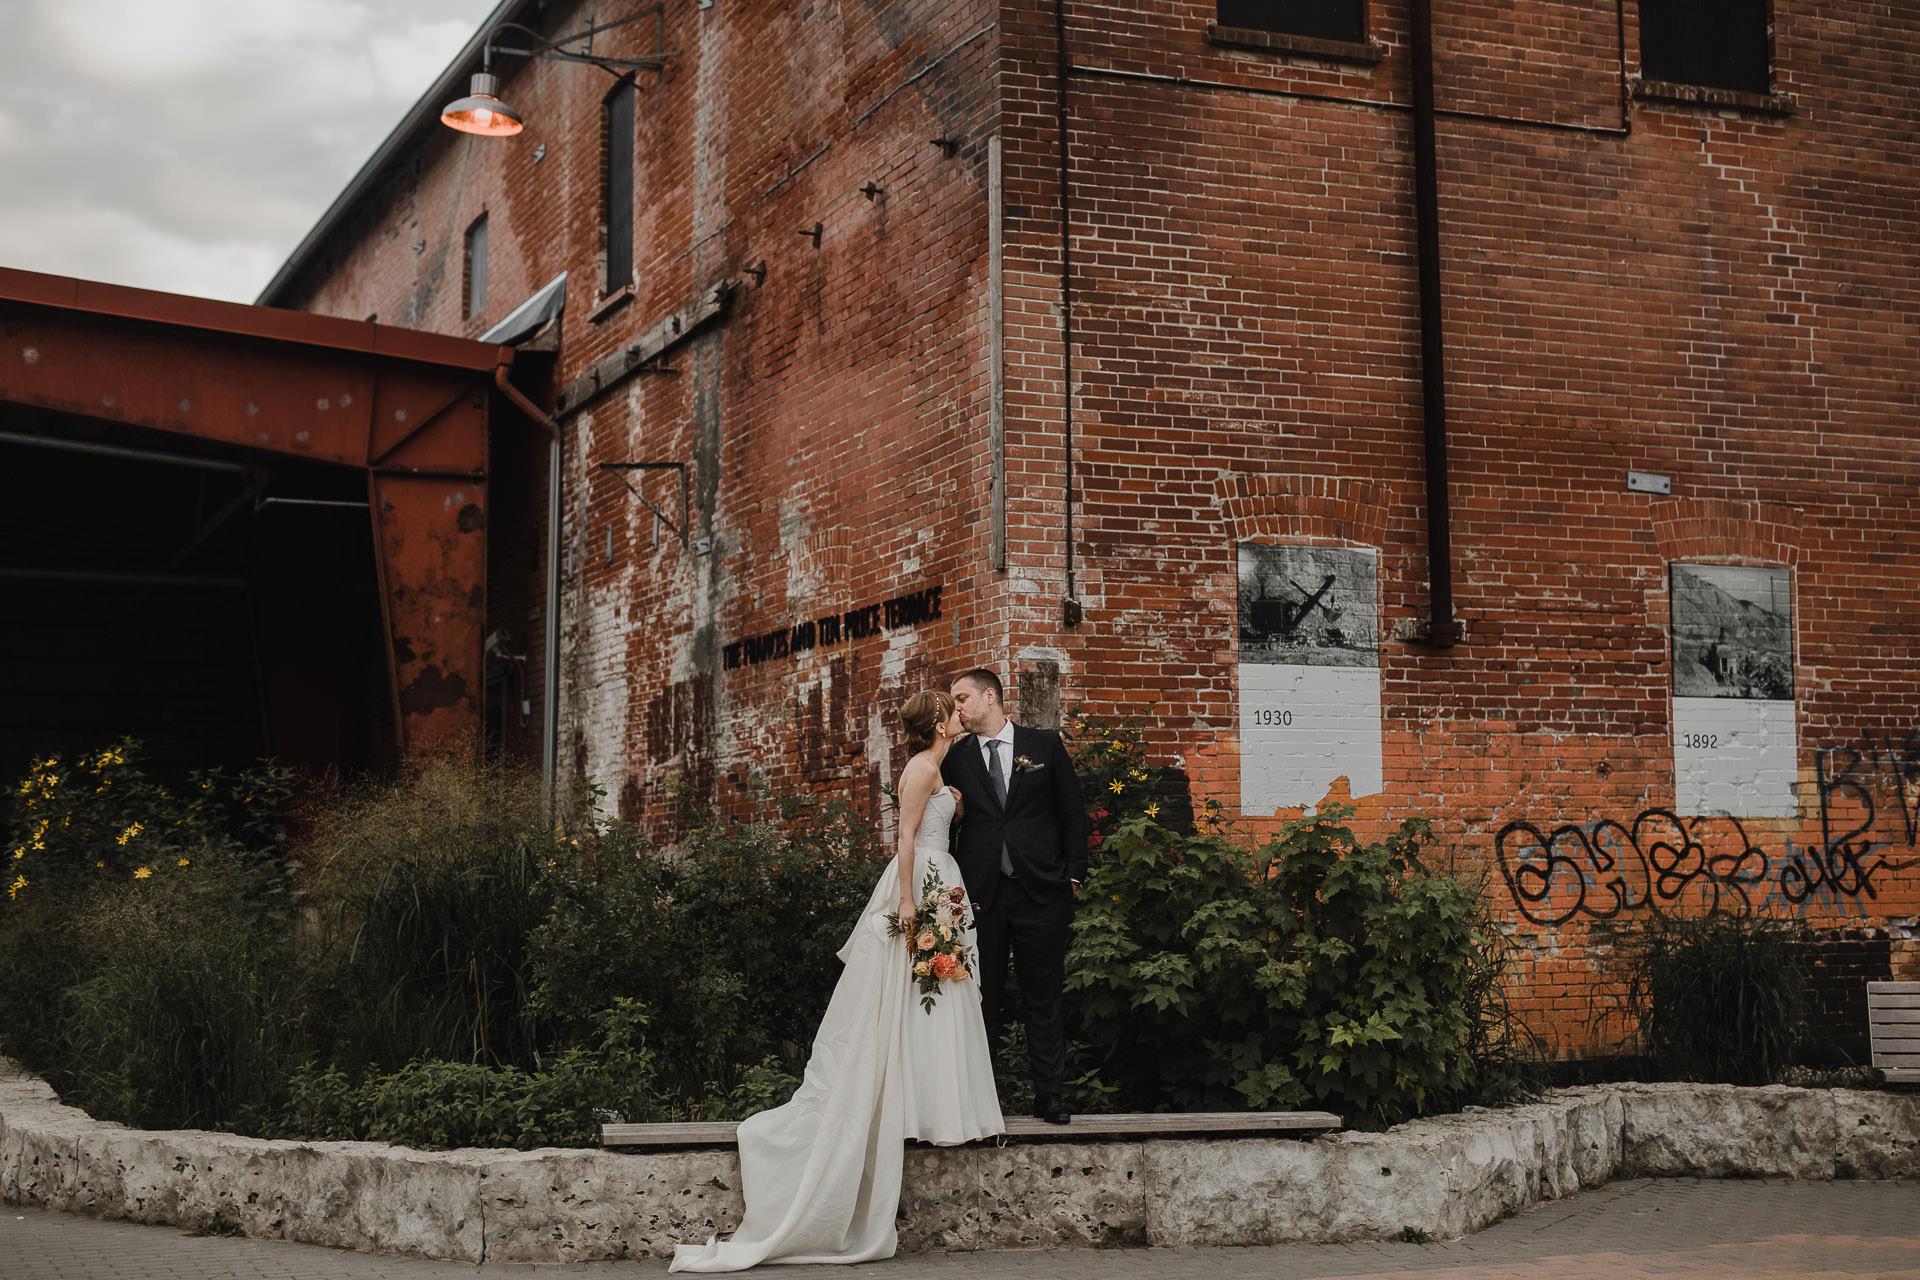 Evergreen Brickworks wedding photographer - wedding portraits at evergreen brickworks